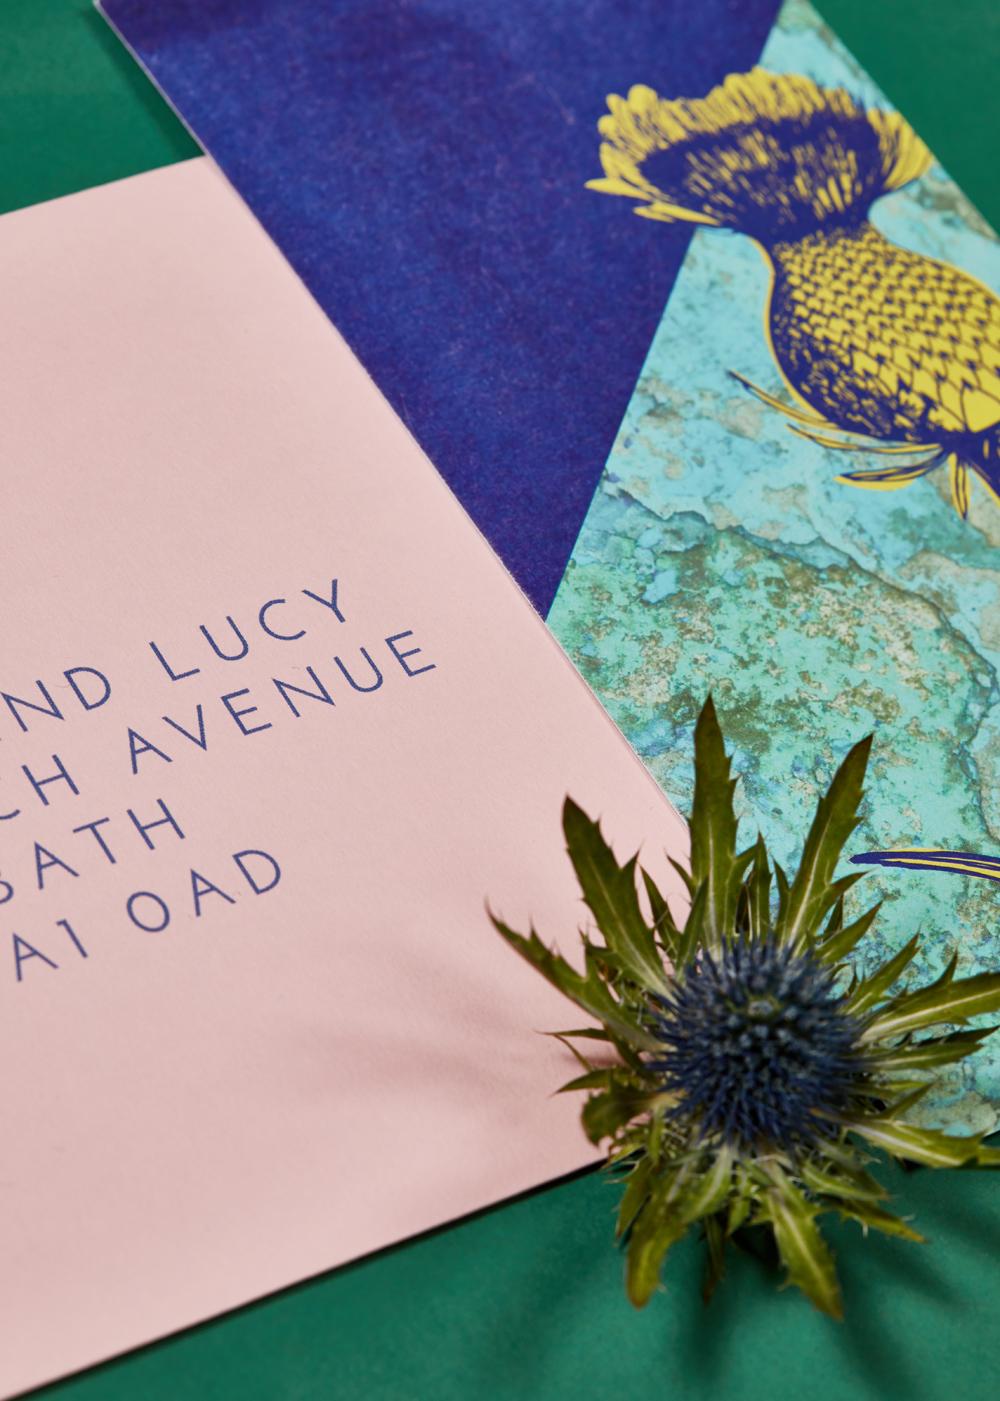 Sarah and Rob's bespoke wedding invitations